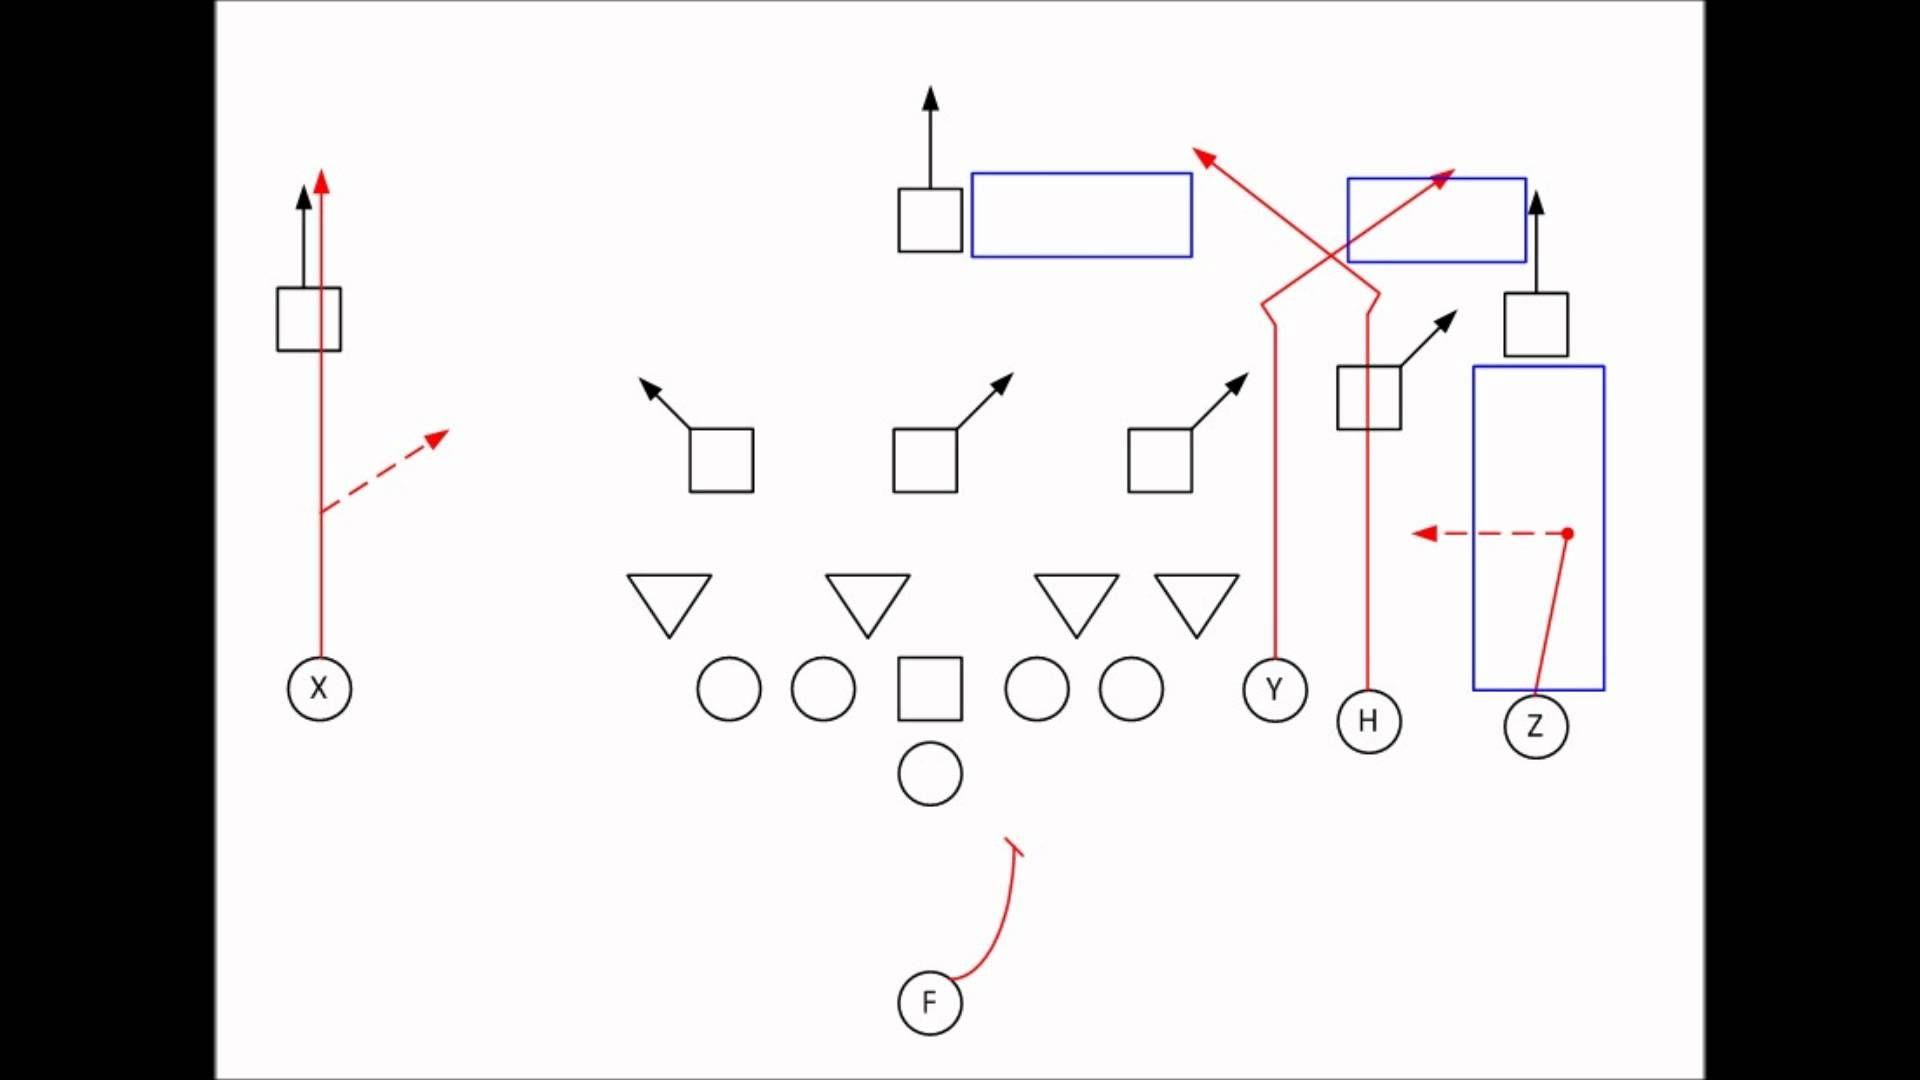 small resolution of attacking the defense cover 3 vs smash concept